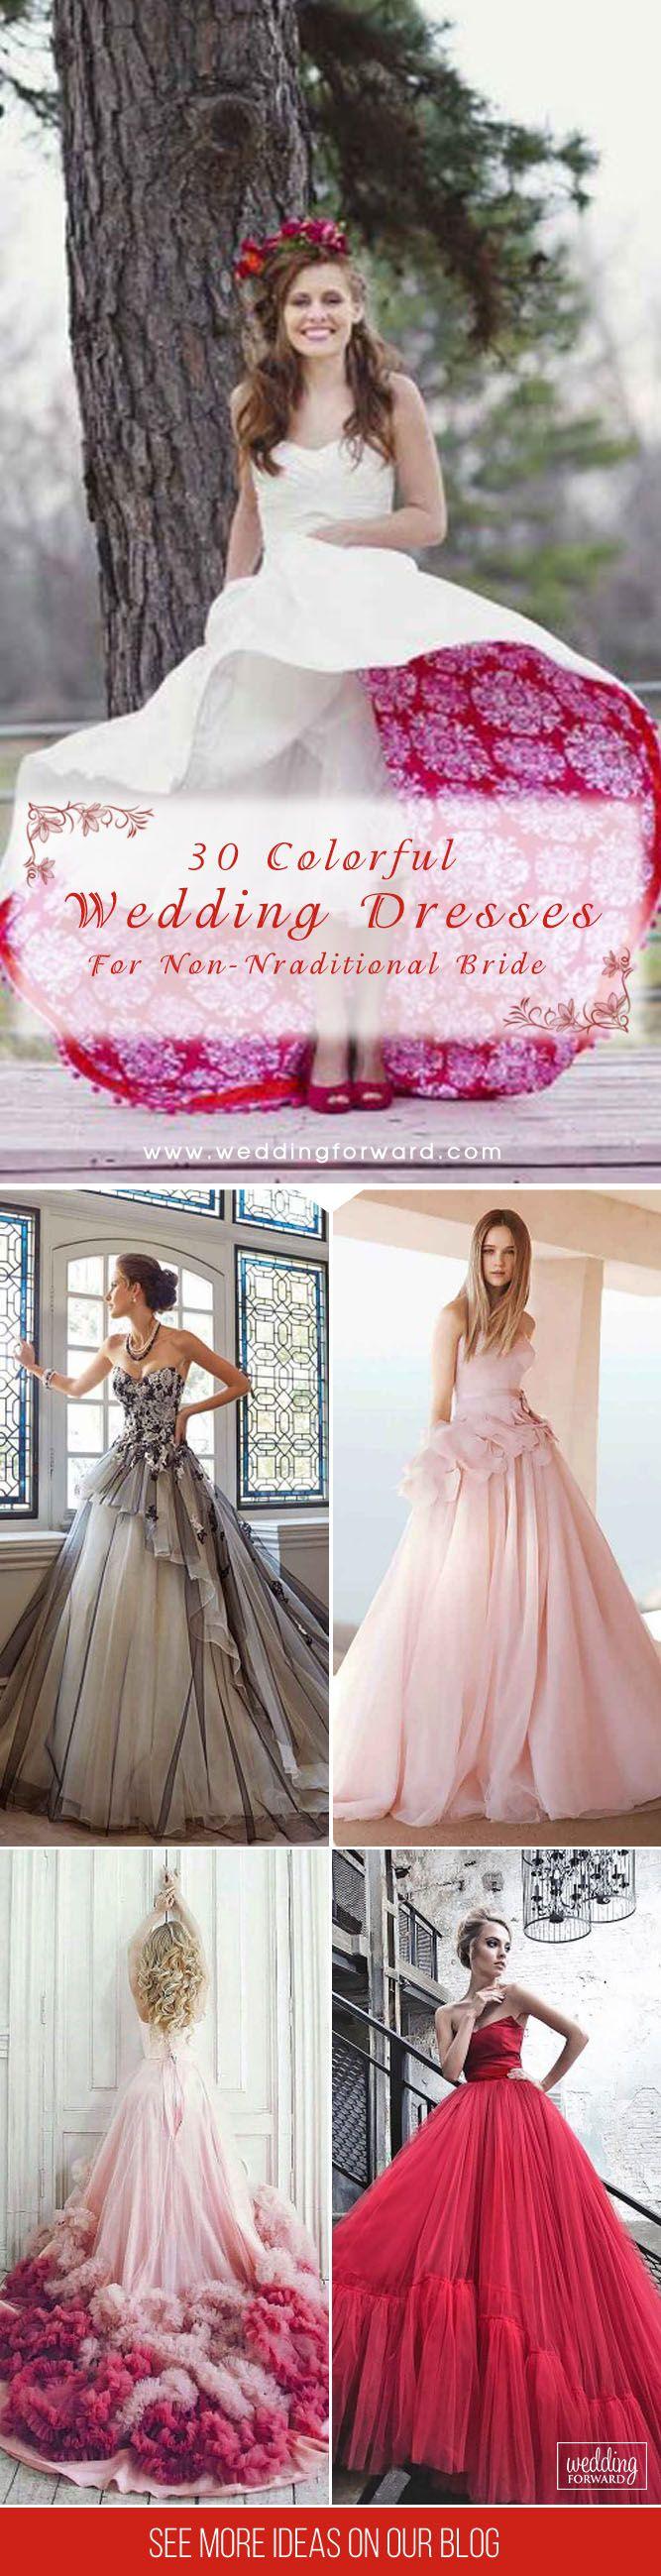 24 Colorful Wedding Dresses For Non-Traditional Bride | Vestidos ...